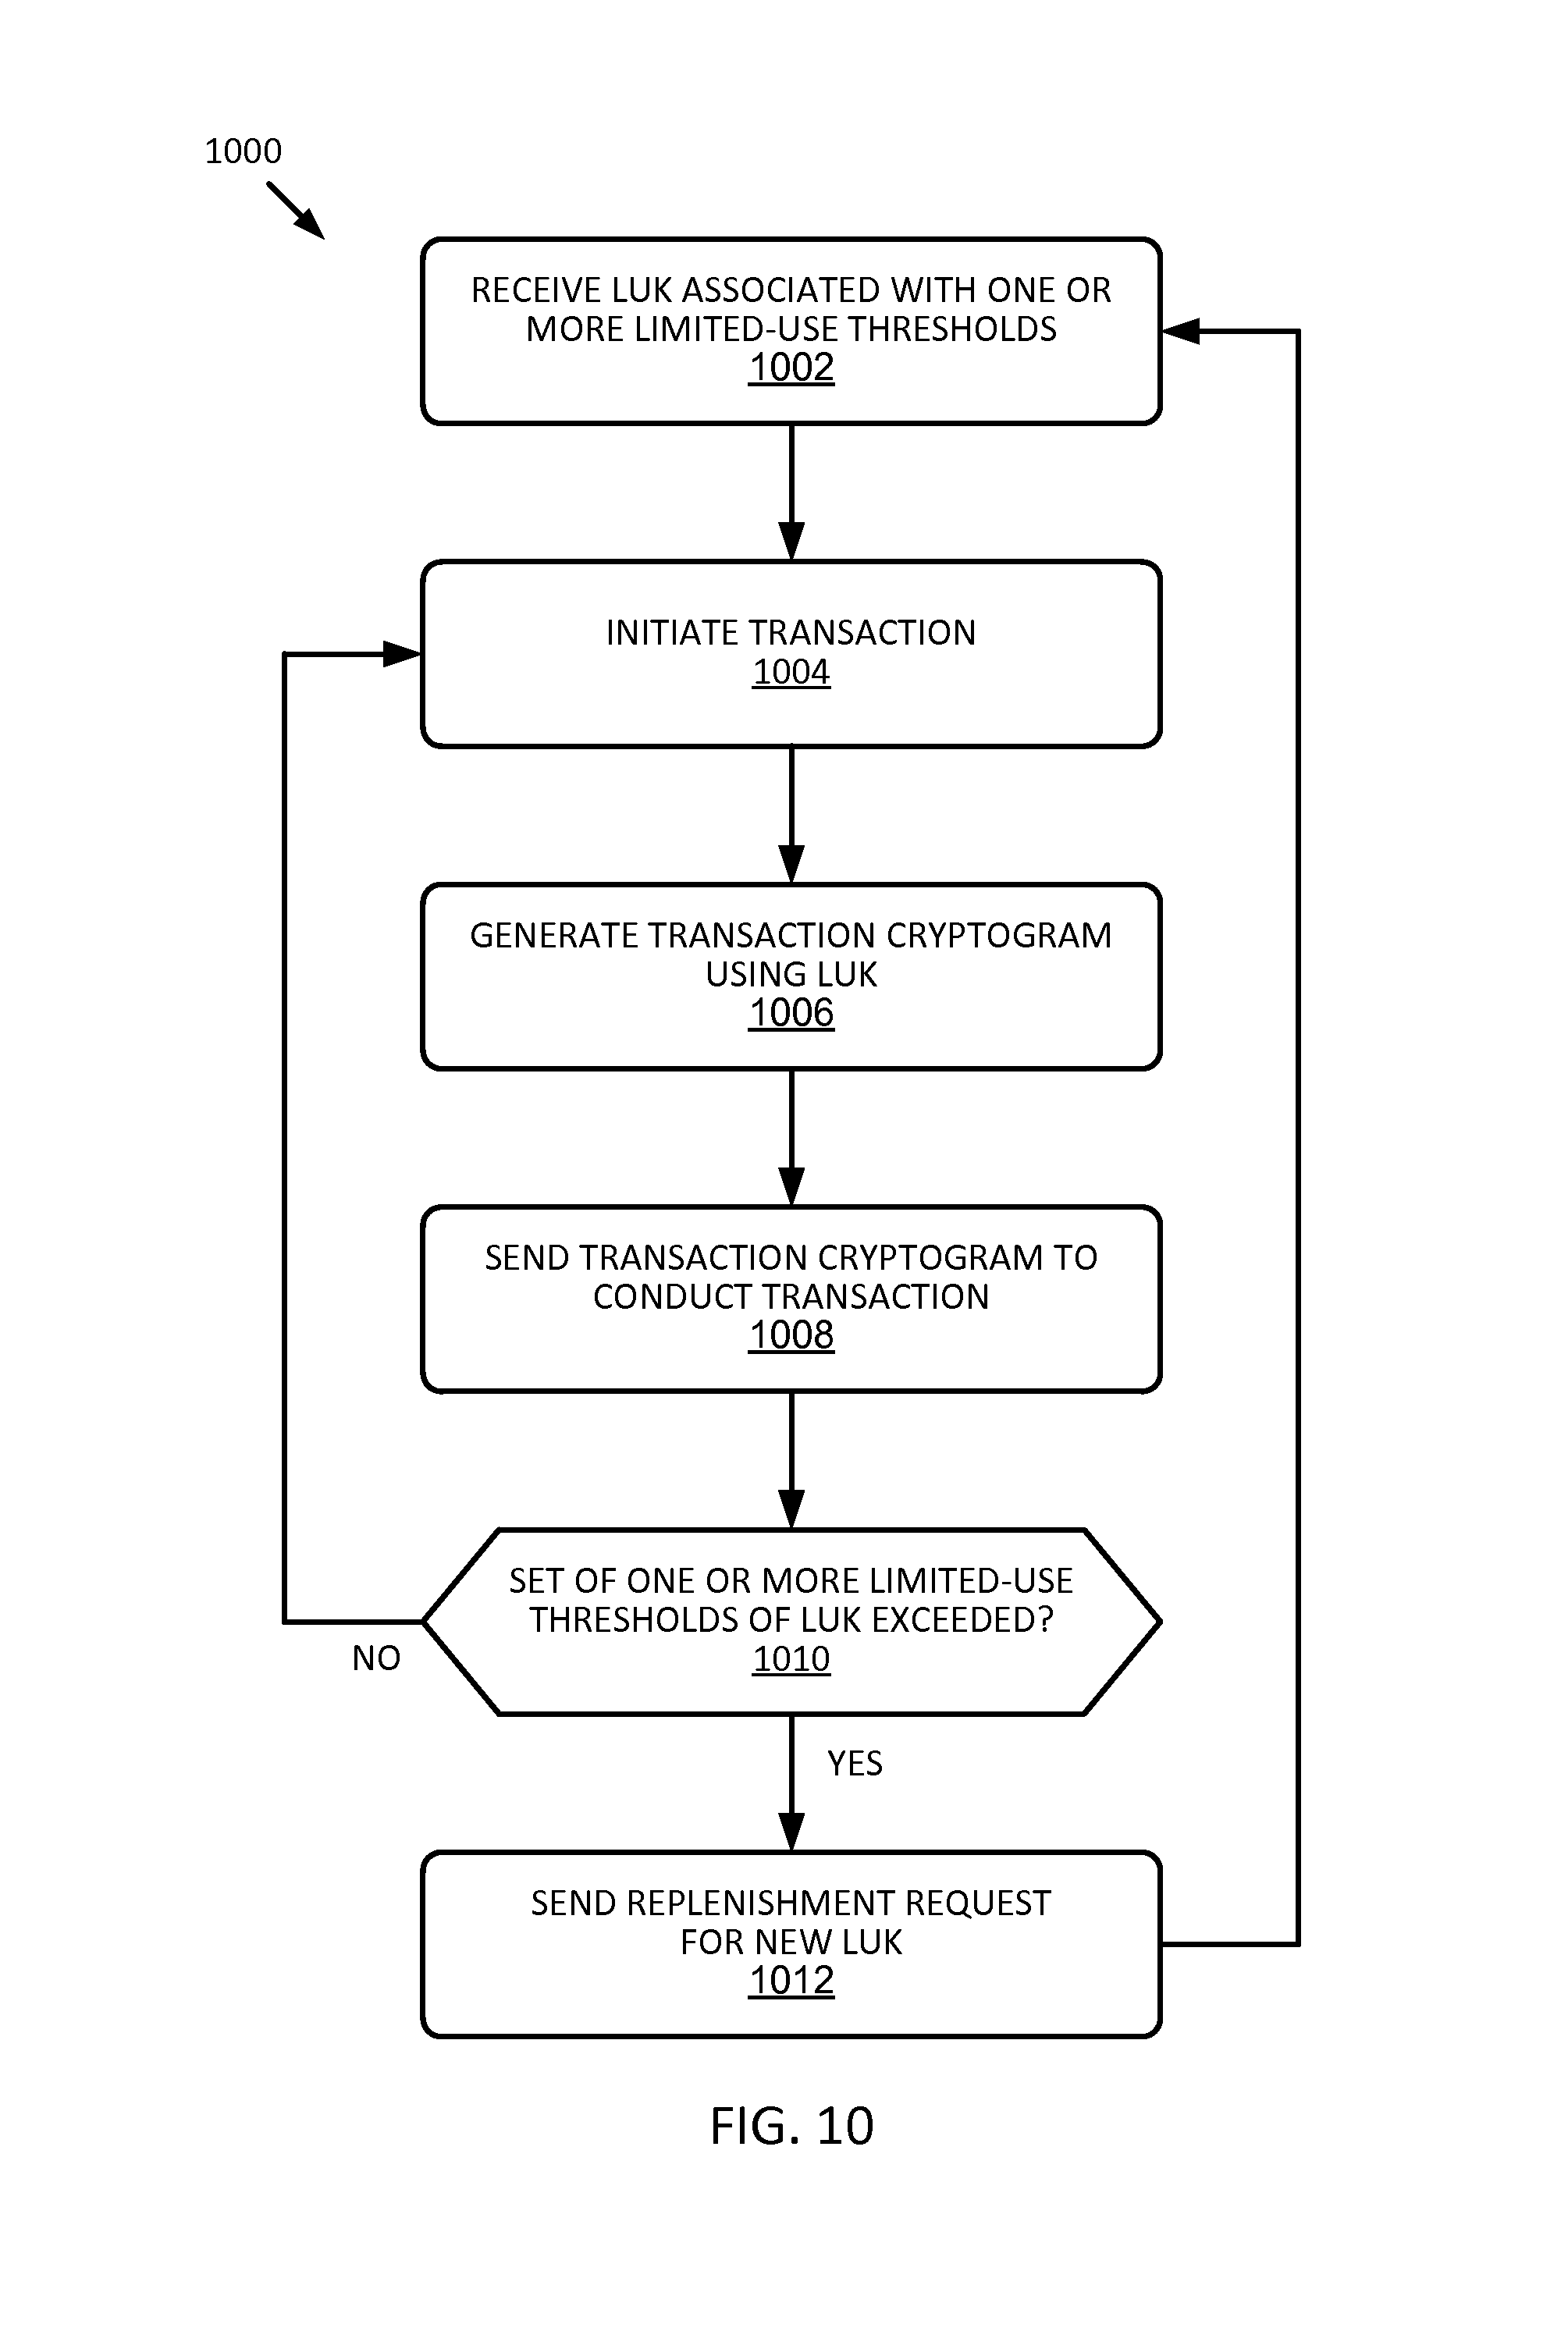 Patent US 9,972,005 B2